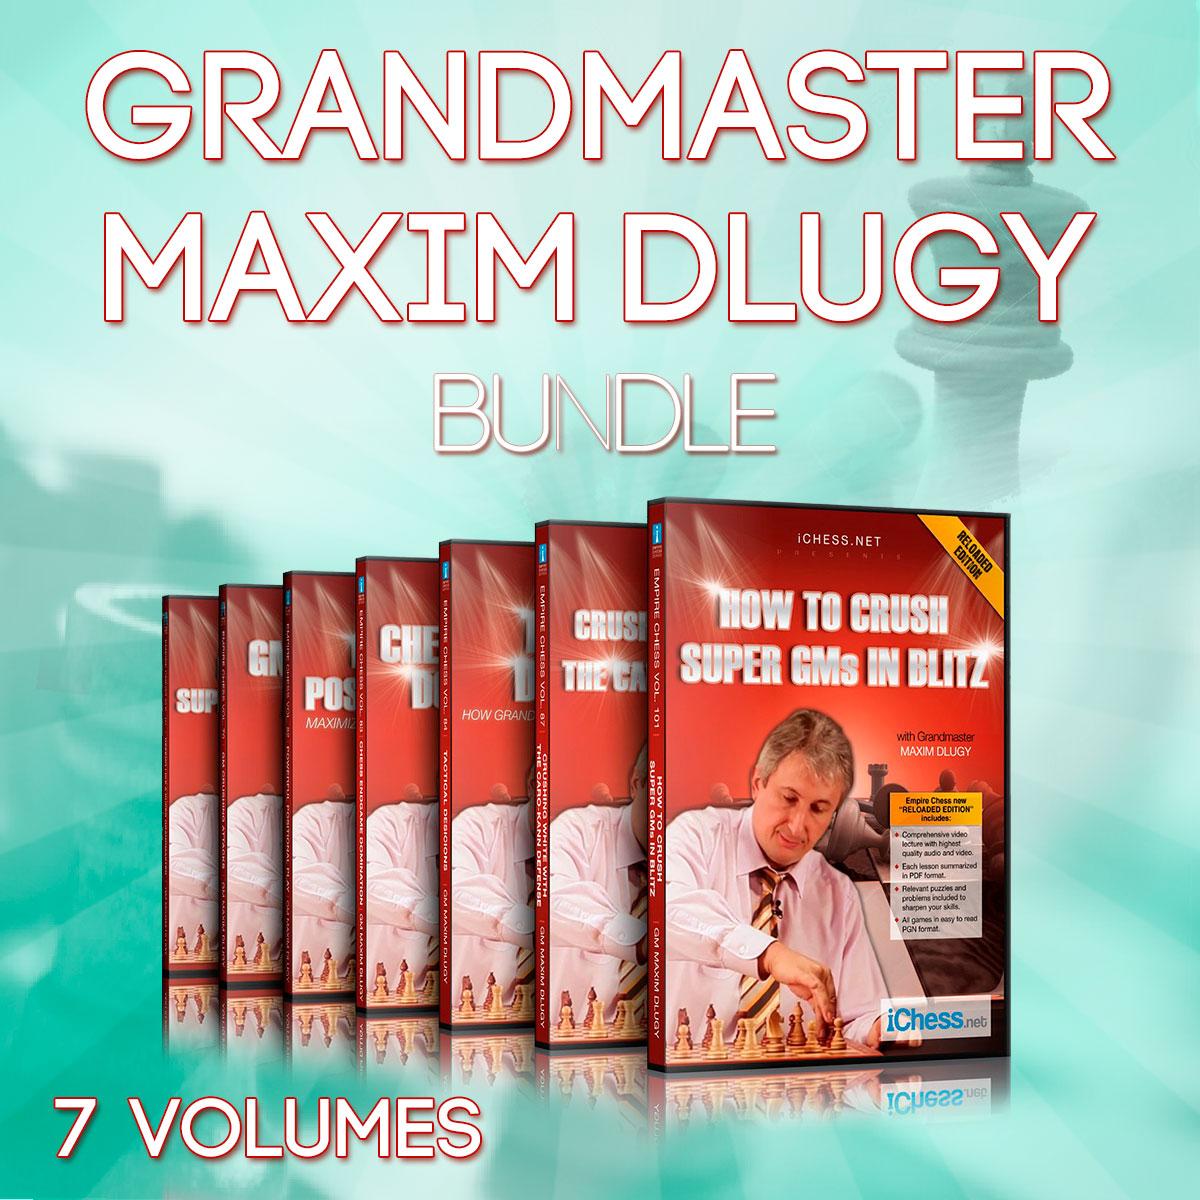 Grandmaster Maxim Dlugy Bundle